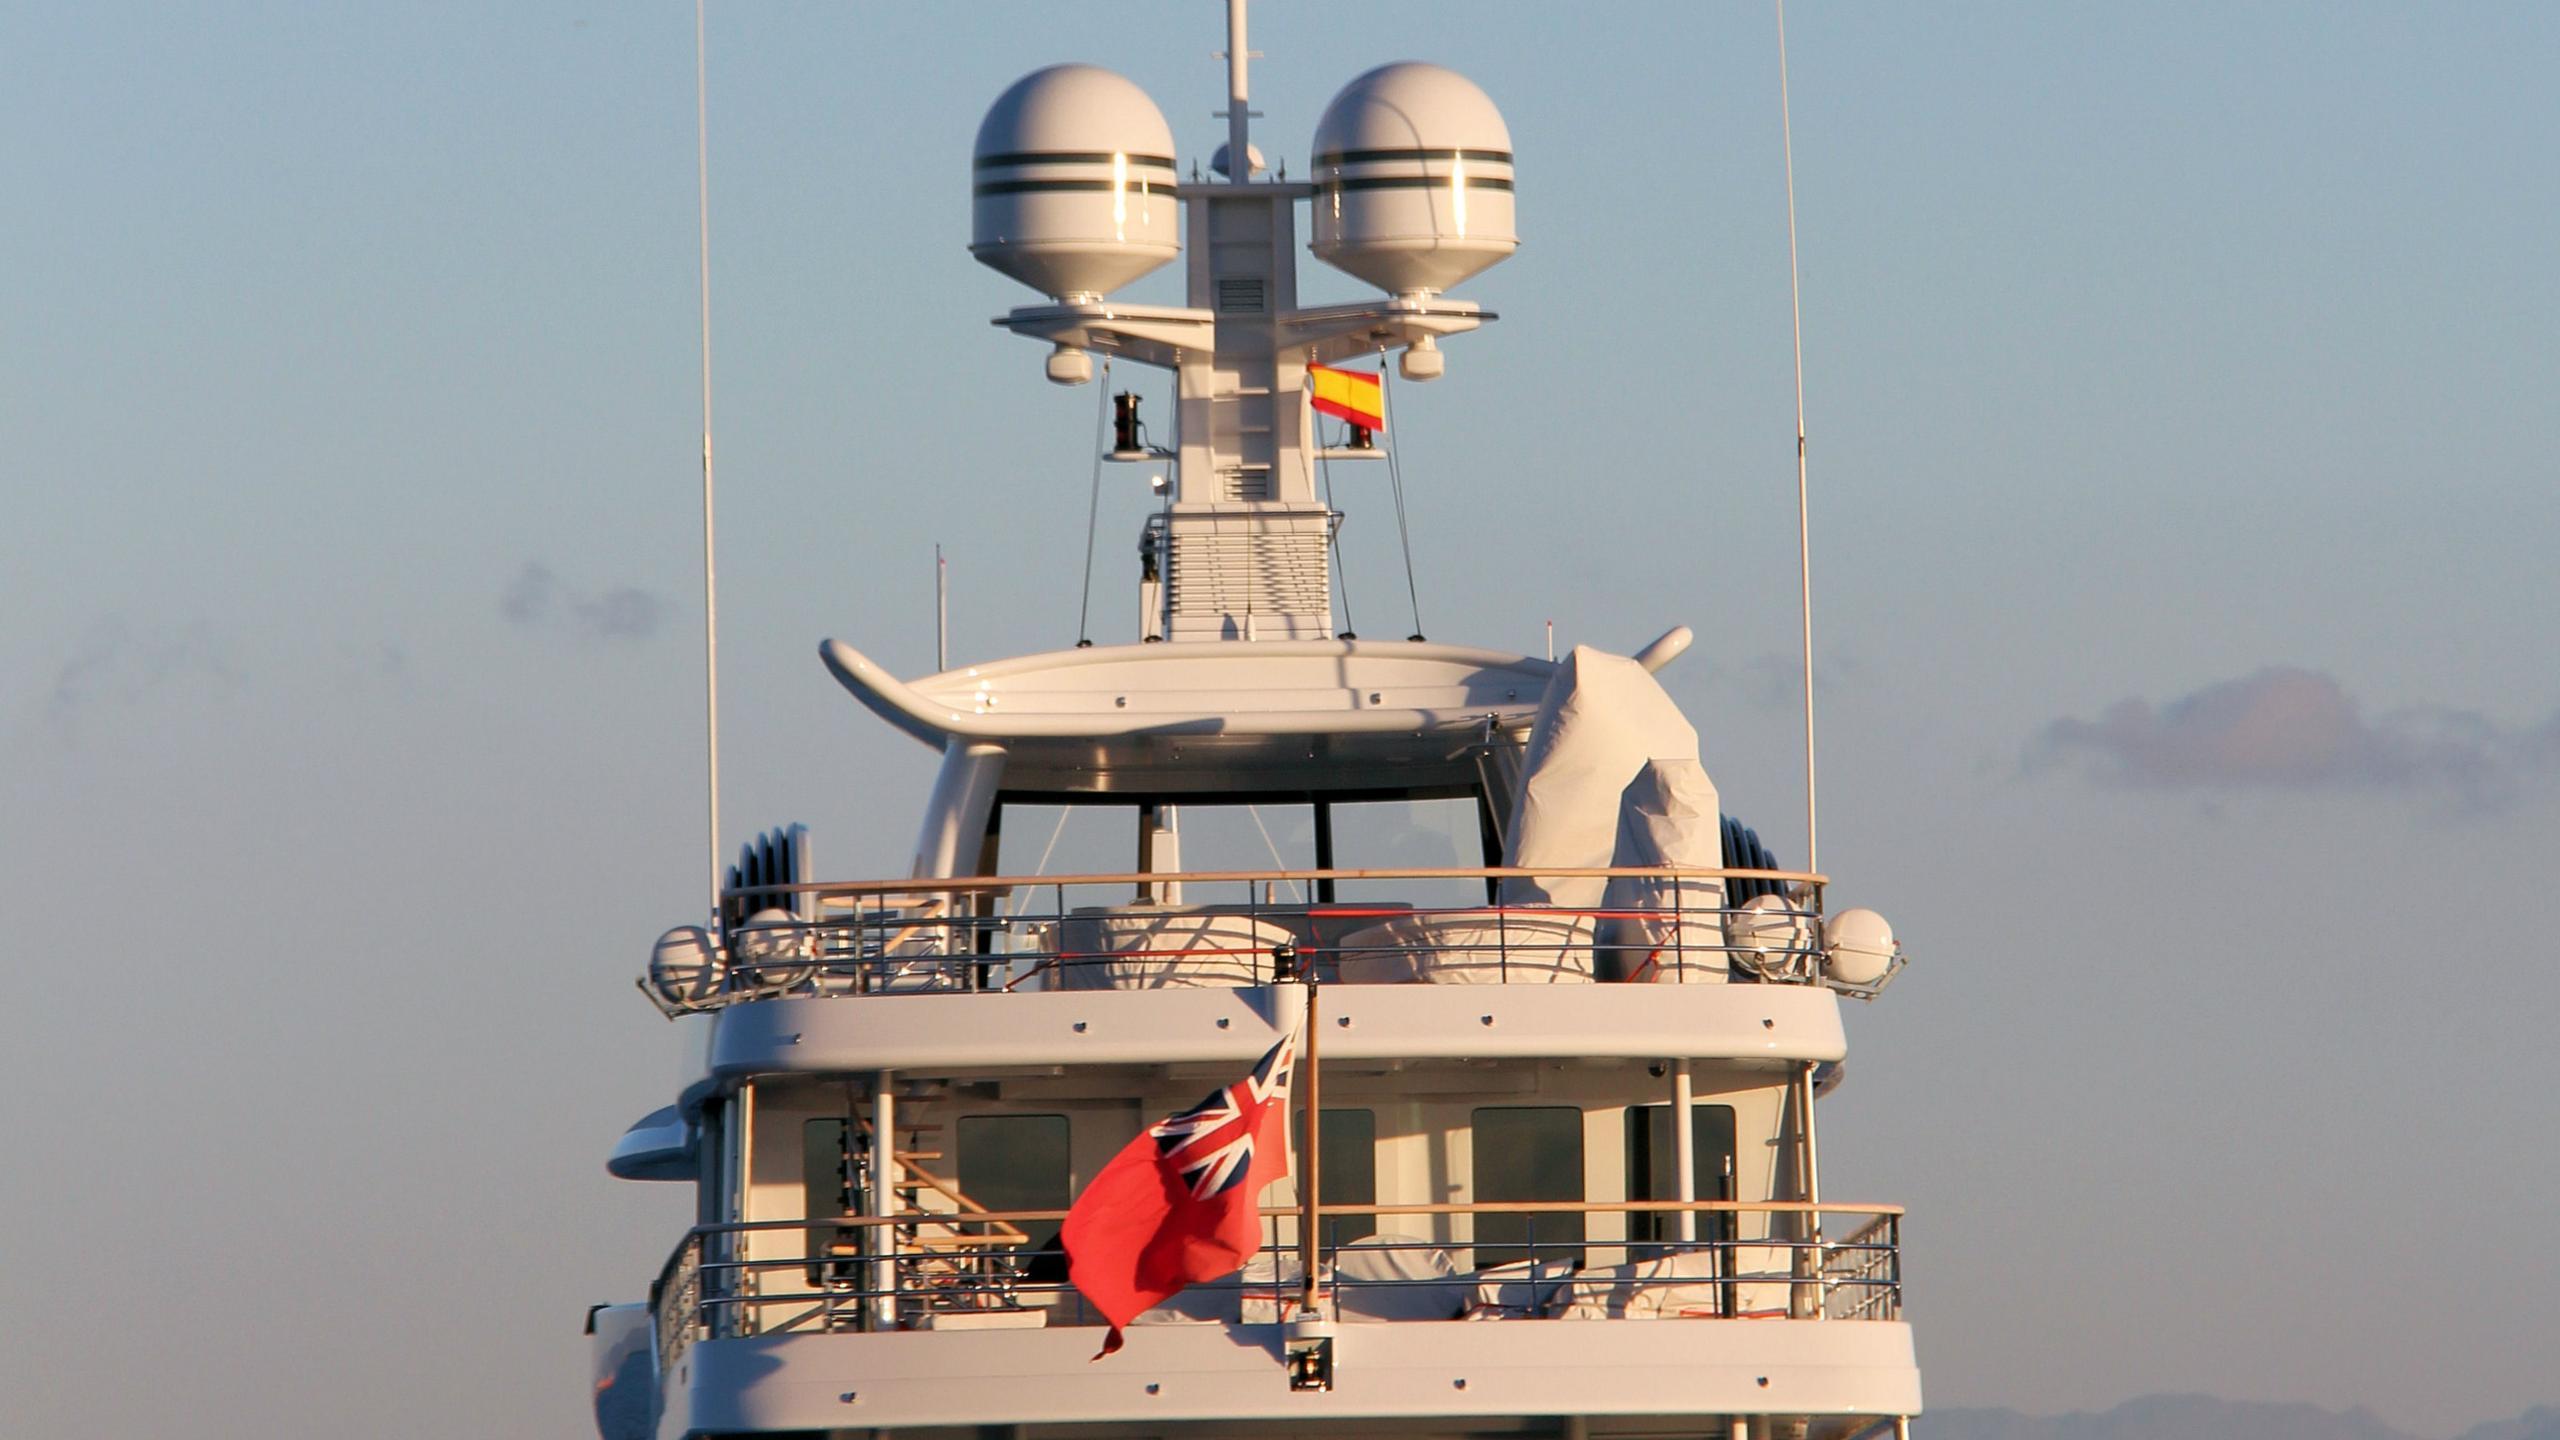 gene-machine-motor-yacht-amels-le-180-2013-55m-berth